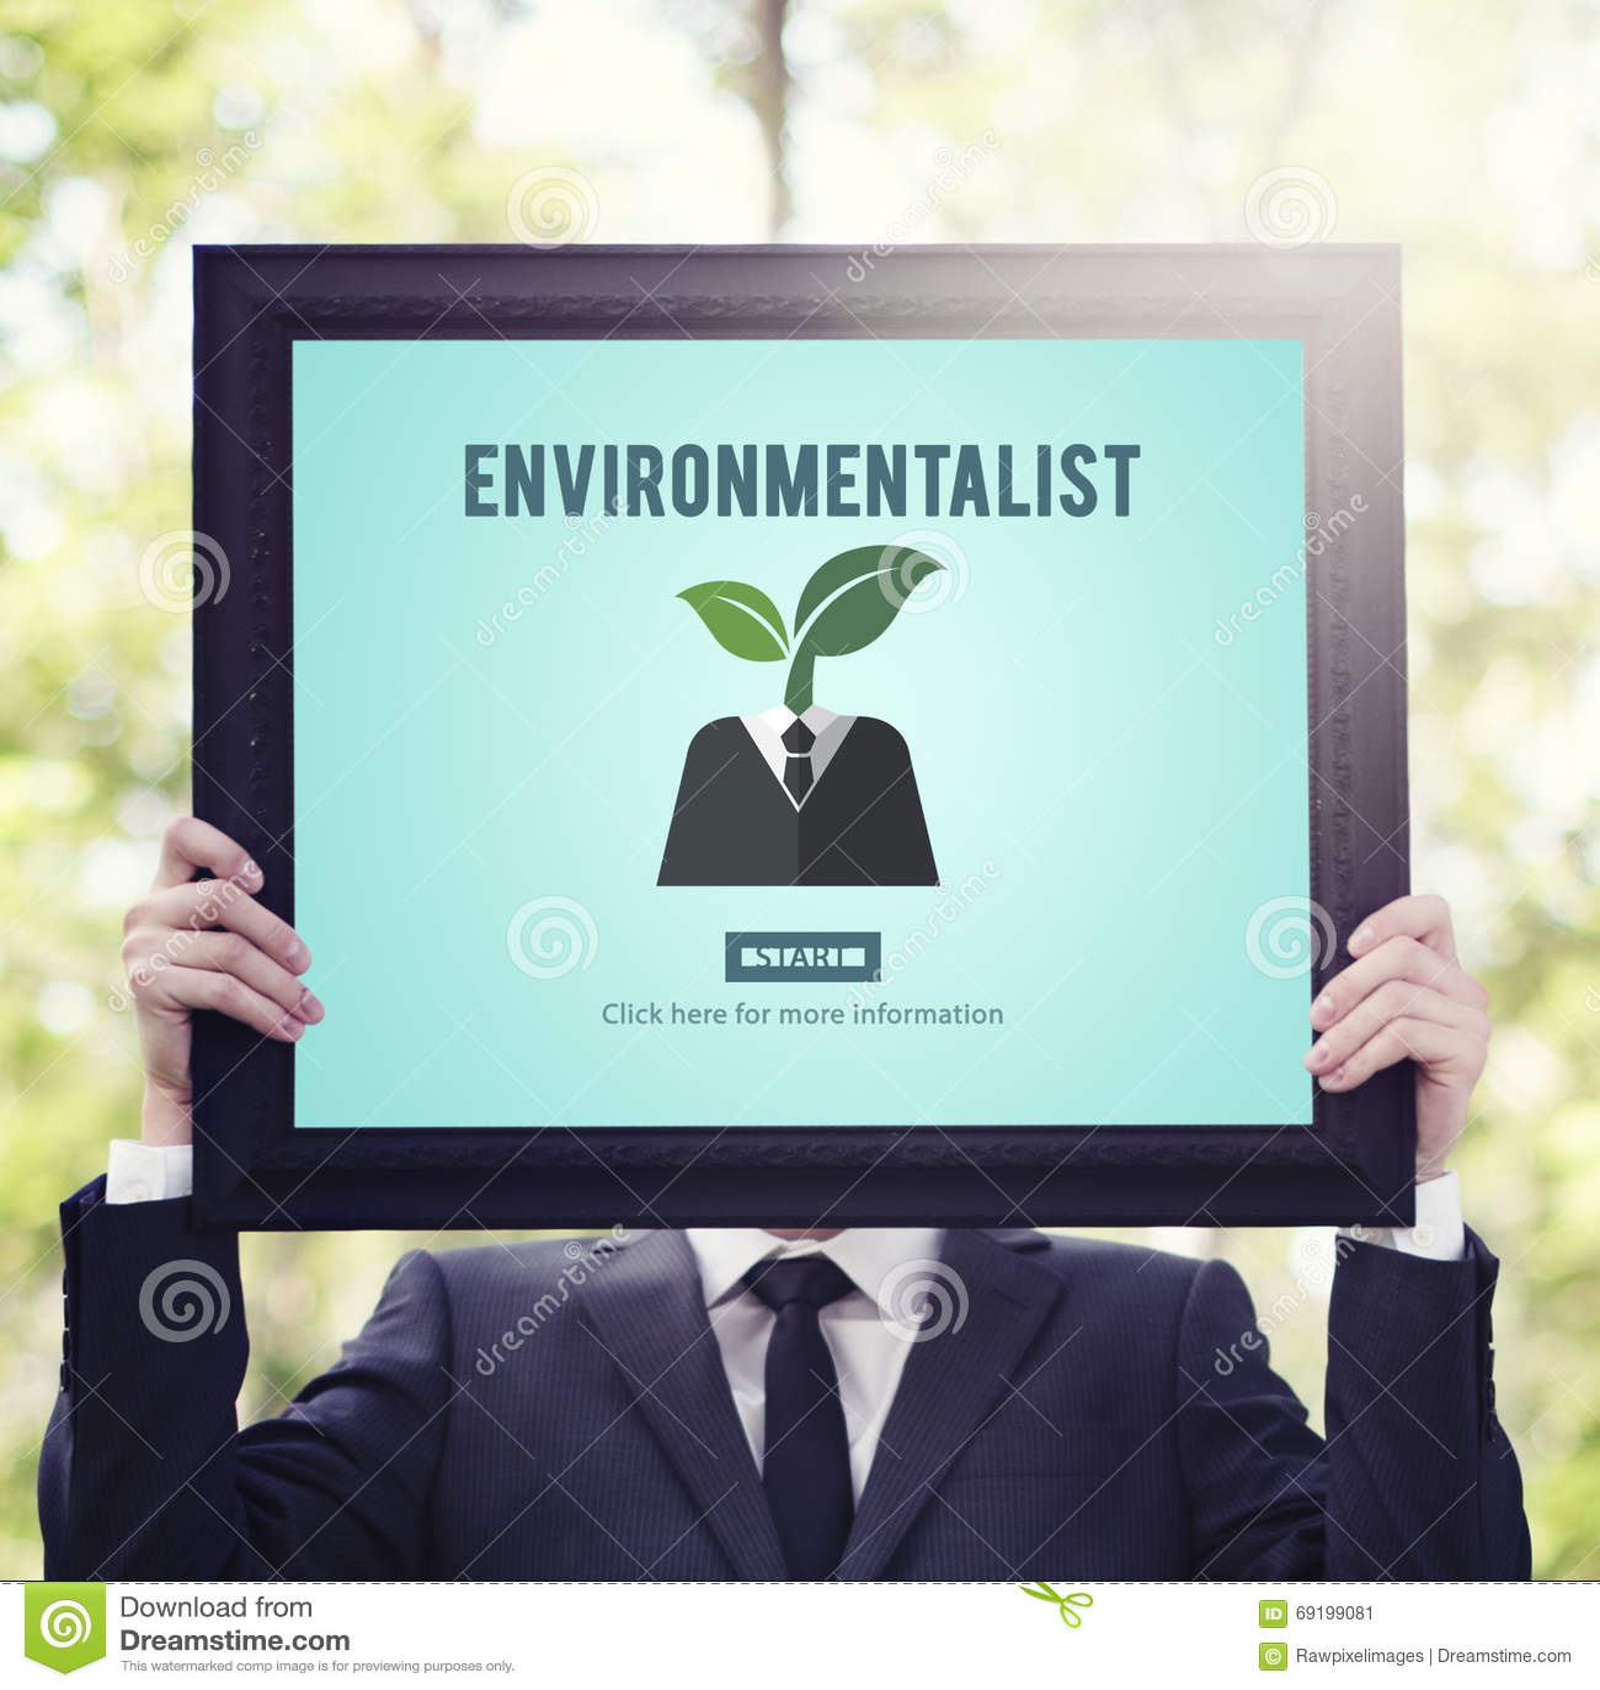 Environmentalist Ecologist Nature Conservationist Concept